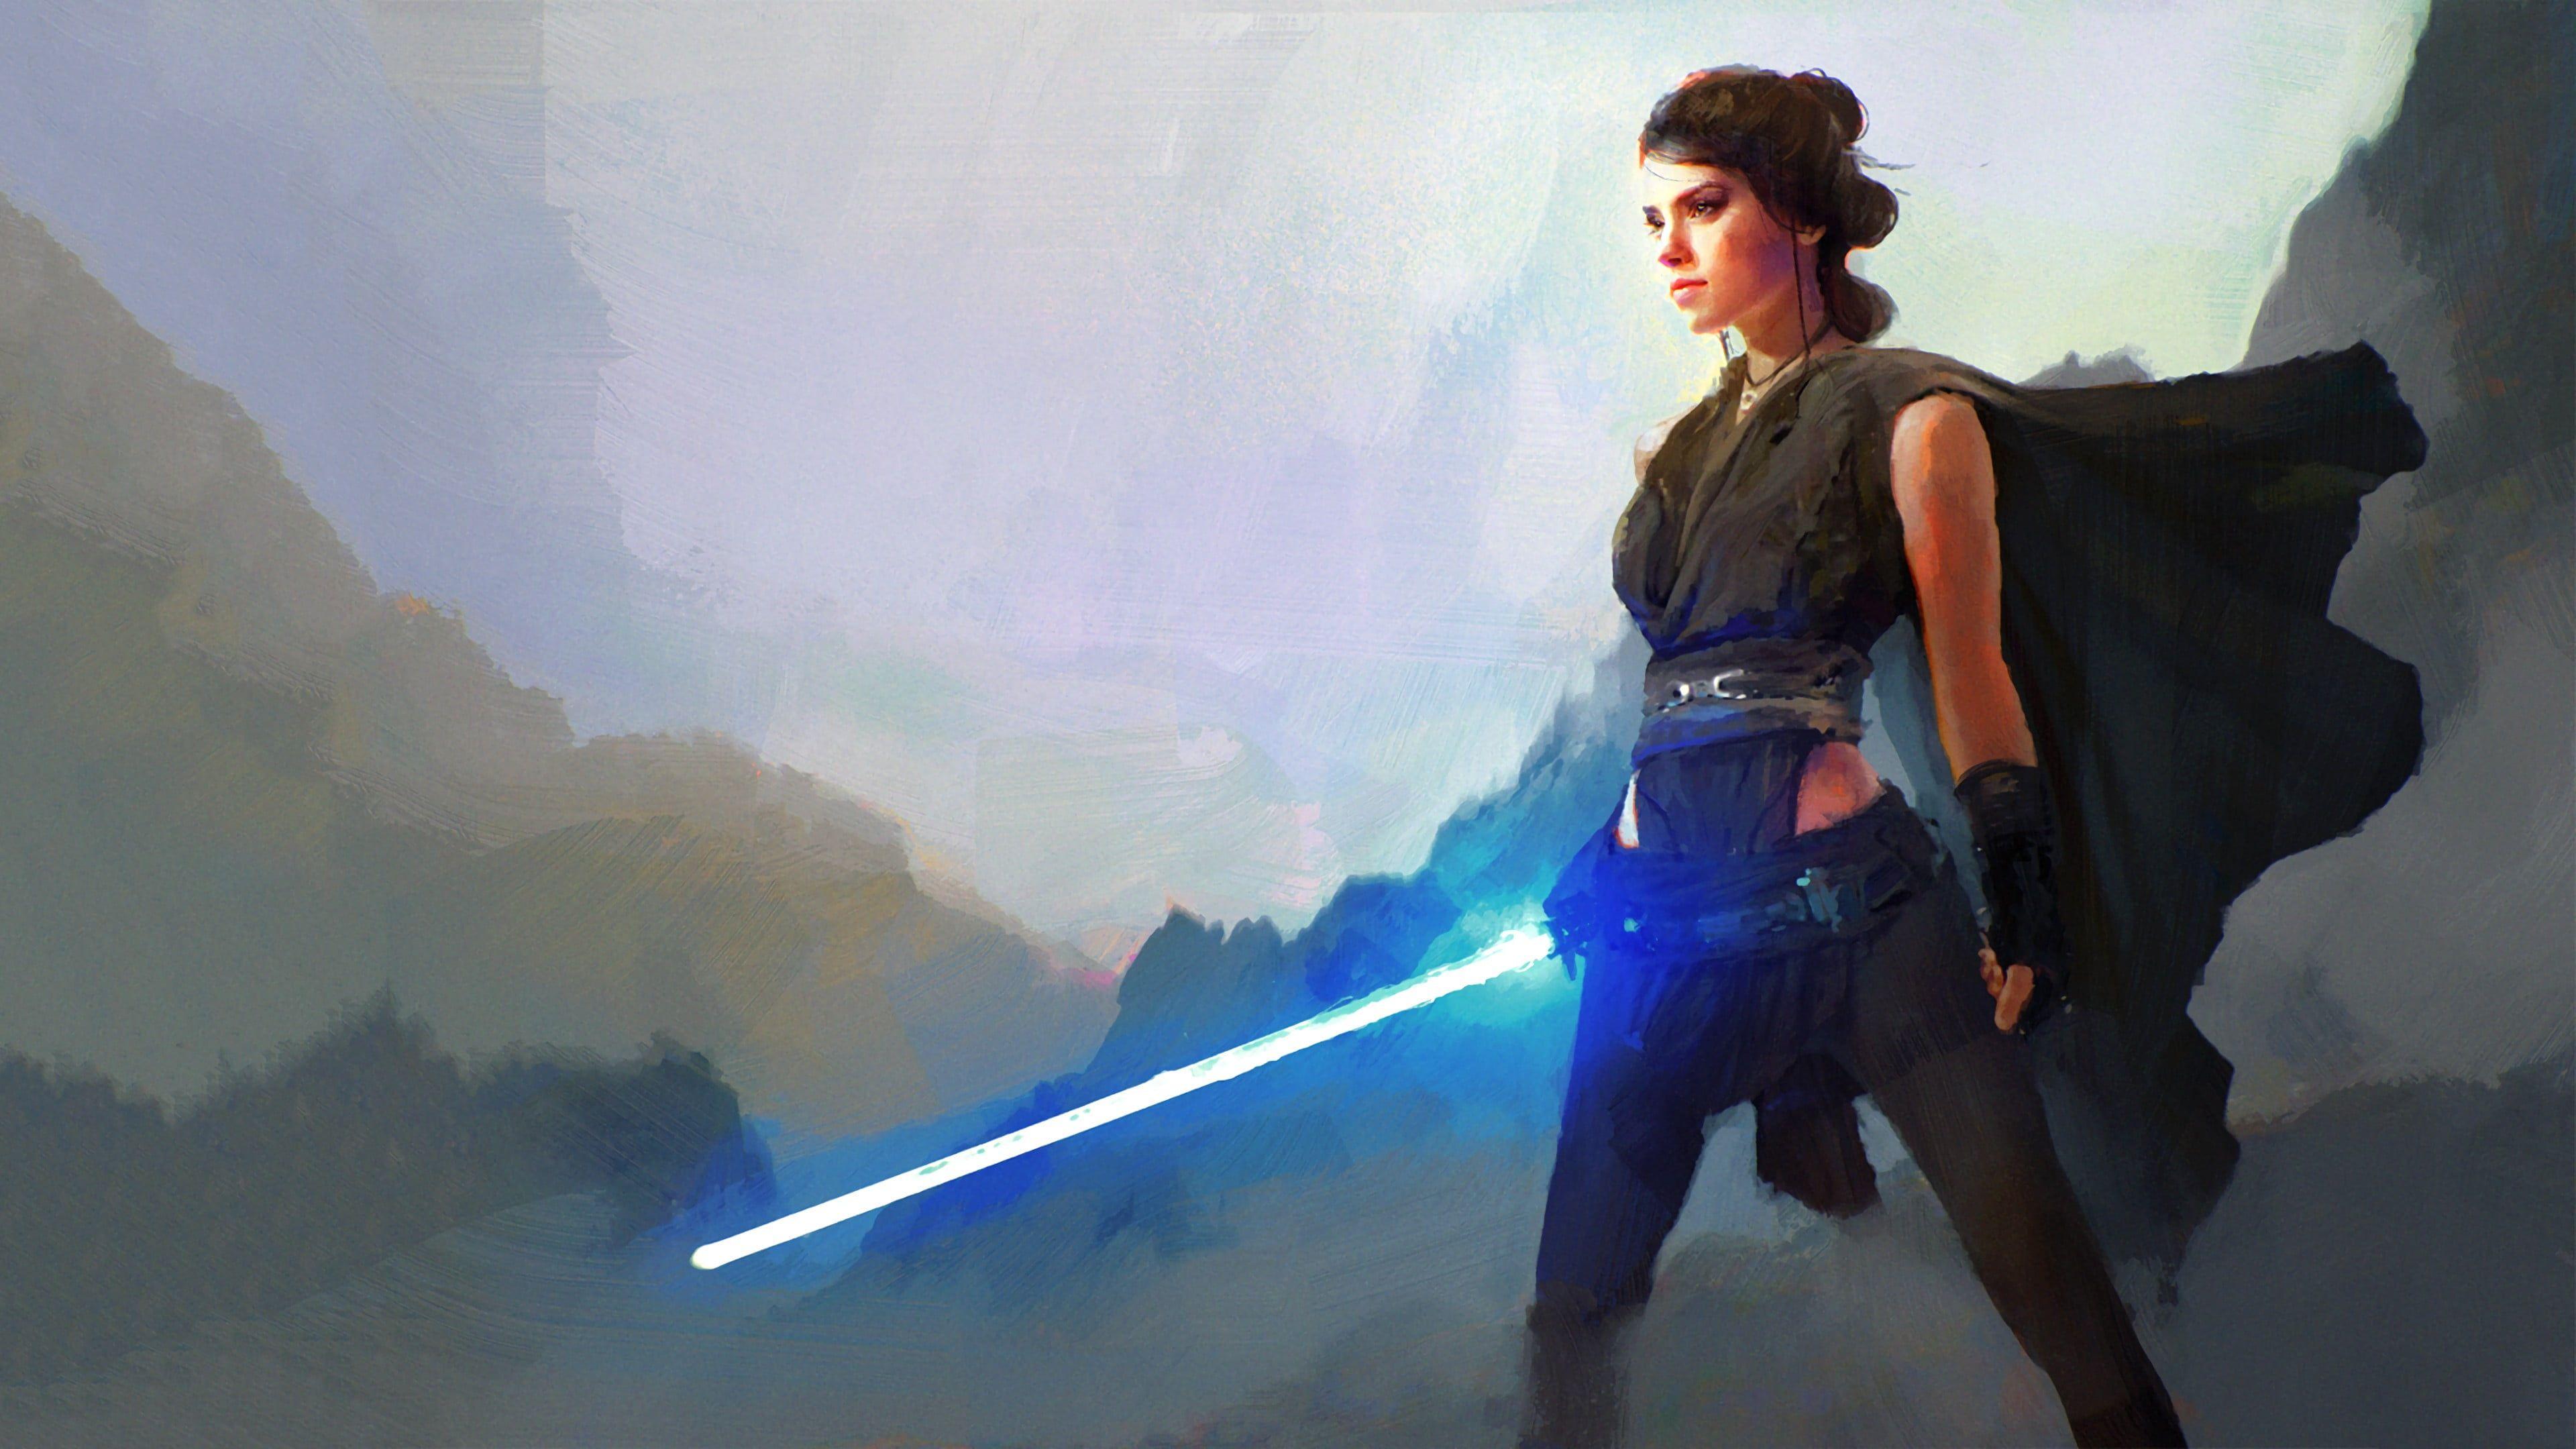 Star Wars Character Illustration Star Wars Rey From Star Wars